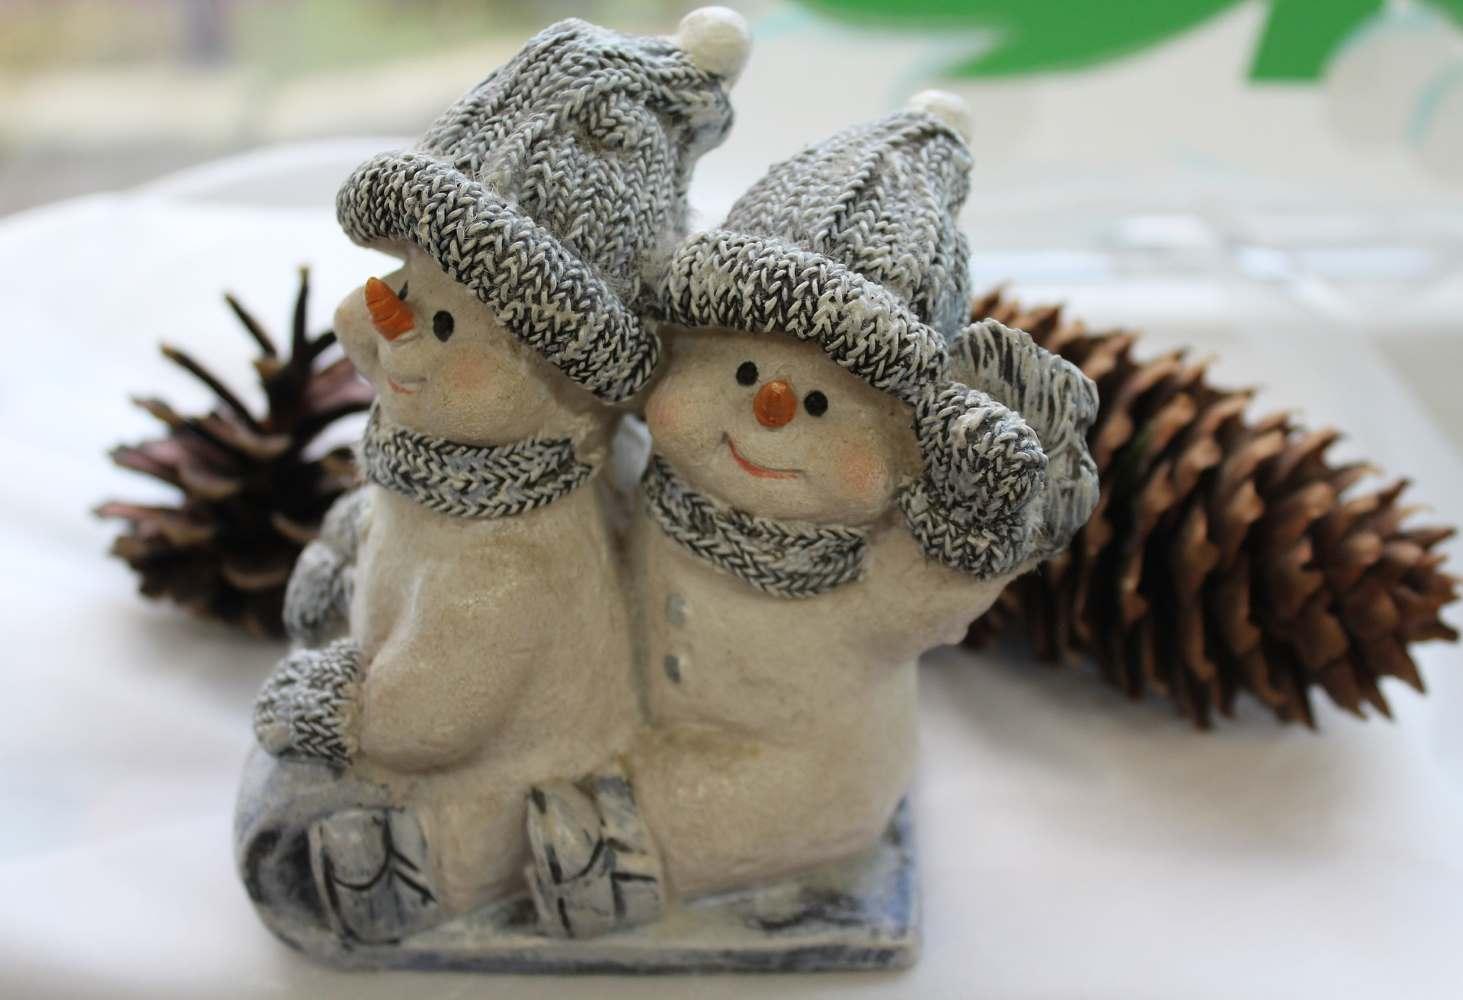 Konkurs-na-luschuju-zimnuju-vystavku-dou-prodolzhaetsya